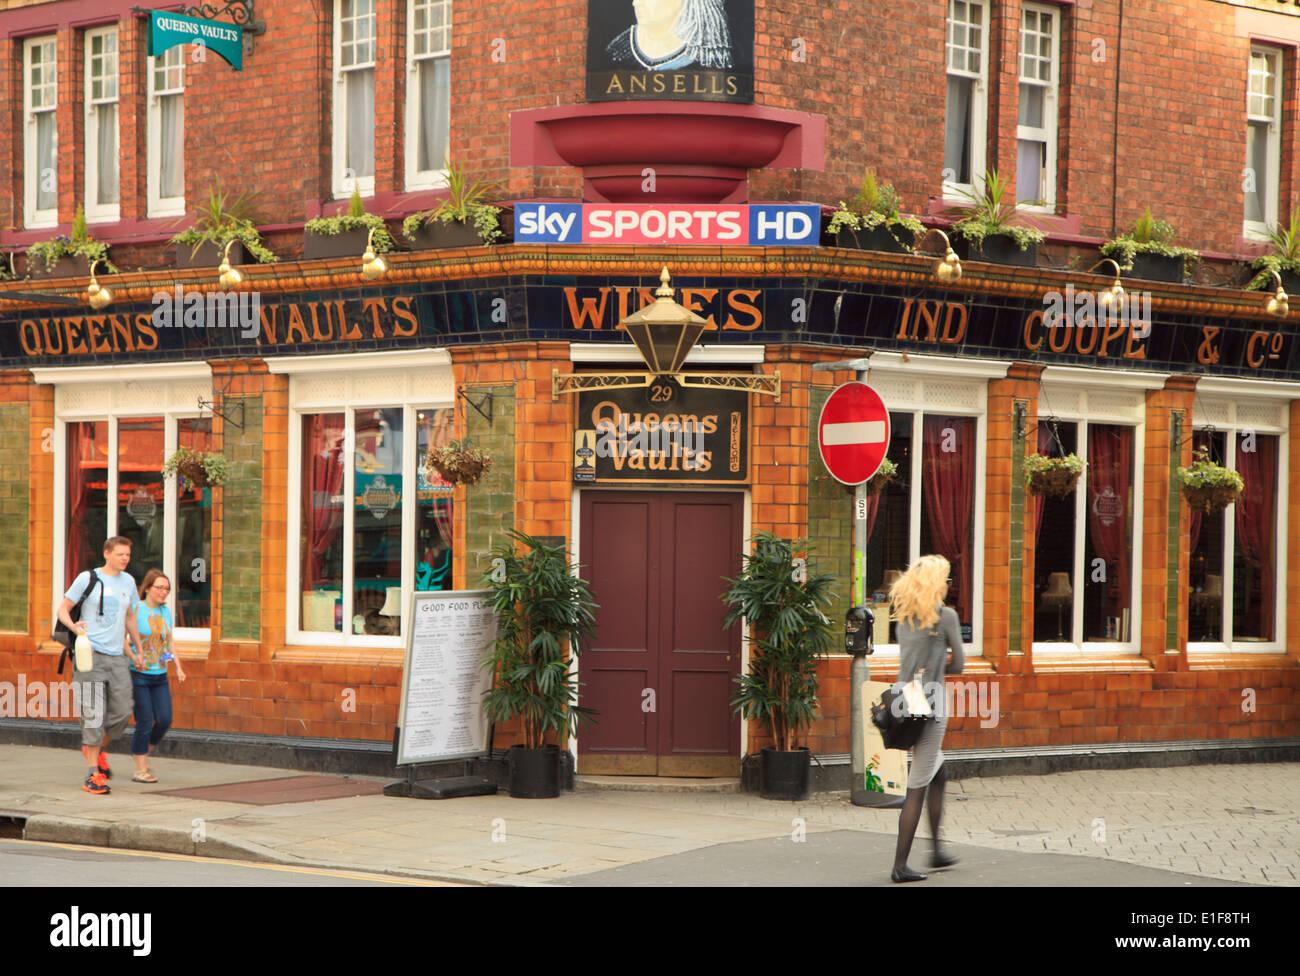 UK, Wales, Cardiff, street scene, pub, restaurant, people, - Stock Image